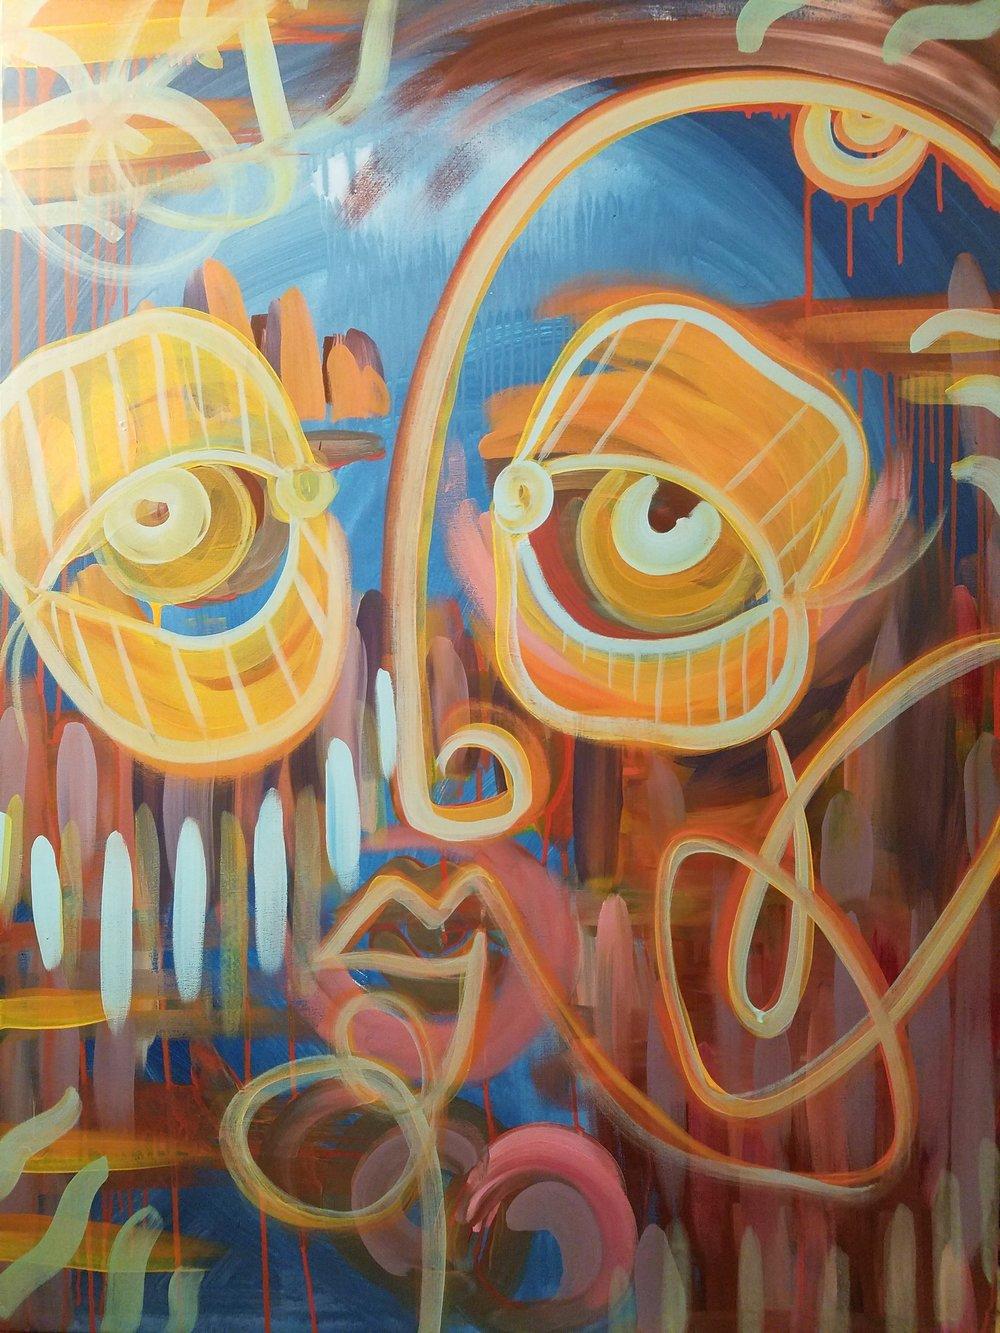 "Untitled 26x48"" Acrylic paint on canvas 2017"